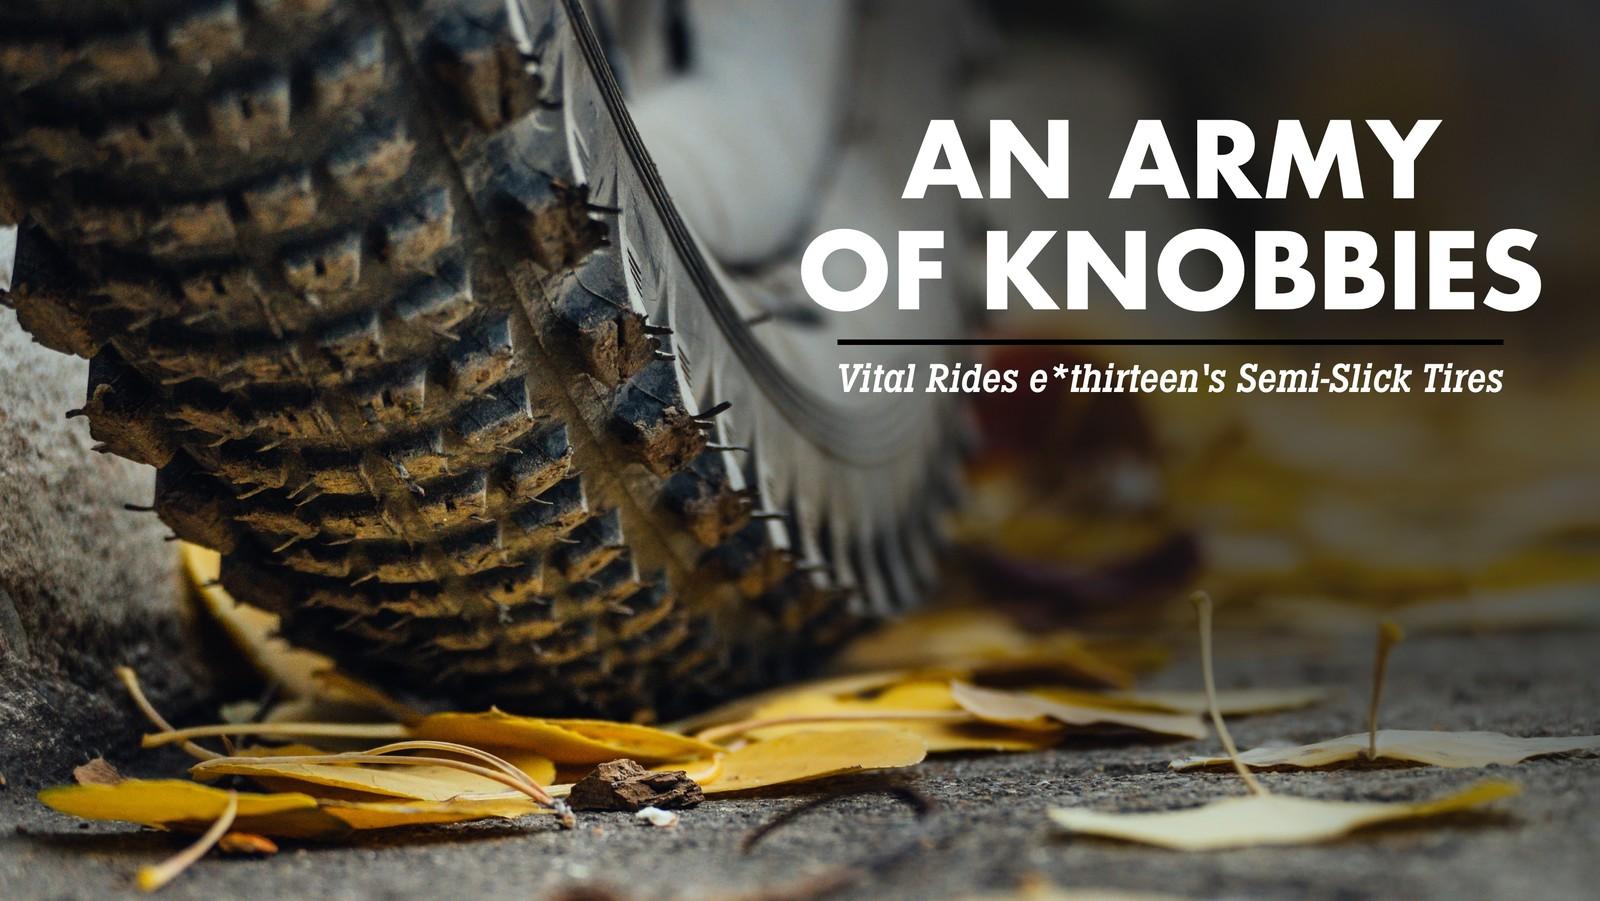 An Army of Knobbies: Vital Rides e*thirteen's Semi-Slick Tire